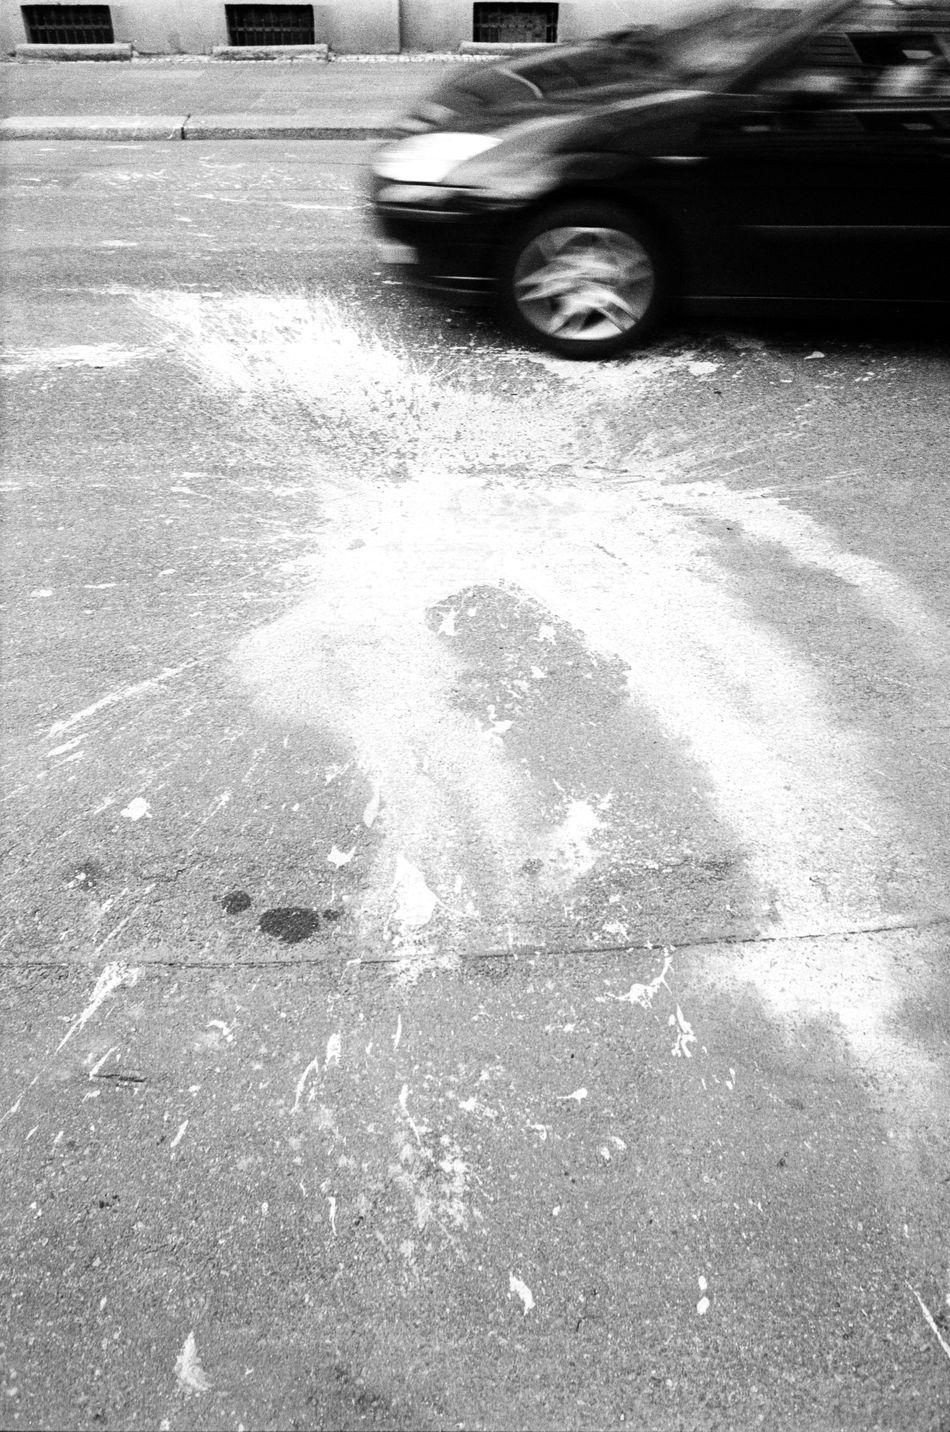 Location: Konsulstraße Canon AE-1 P   APX 100 -> 200   D-76 AgfaPhoto APX 100 (new) Black And White Blackandwhite Canon AE-1 EyeEm Best Shots - Black + White Kodak D-76 Monochrome Street